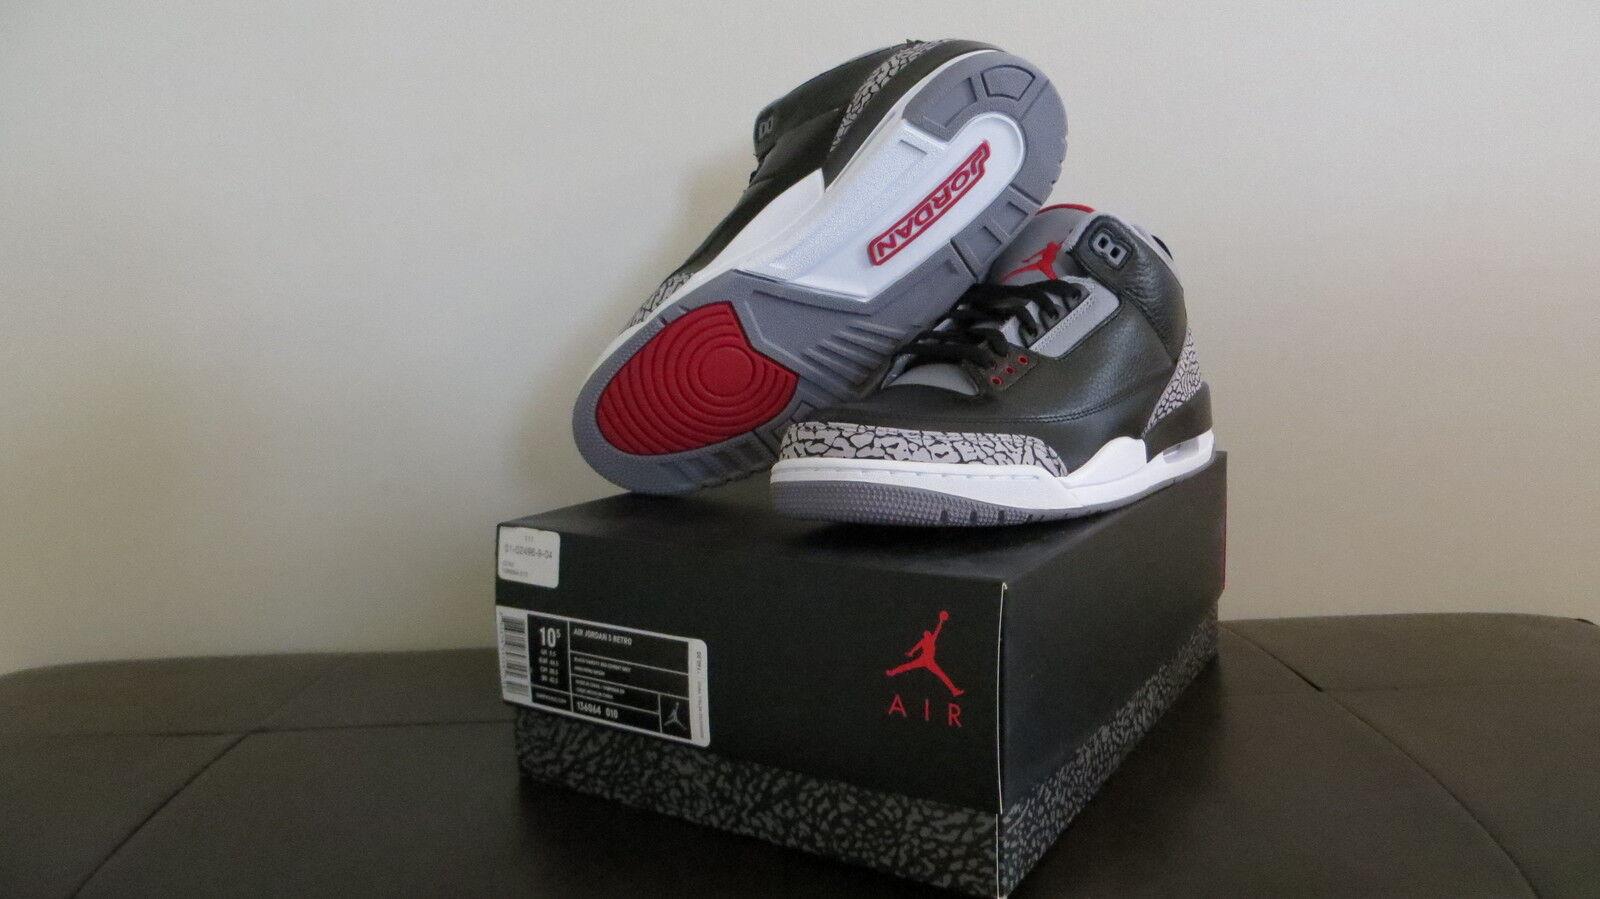 Nike Air Jordan III Black Cement 10.5 10.5 10.5 8e4aff